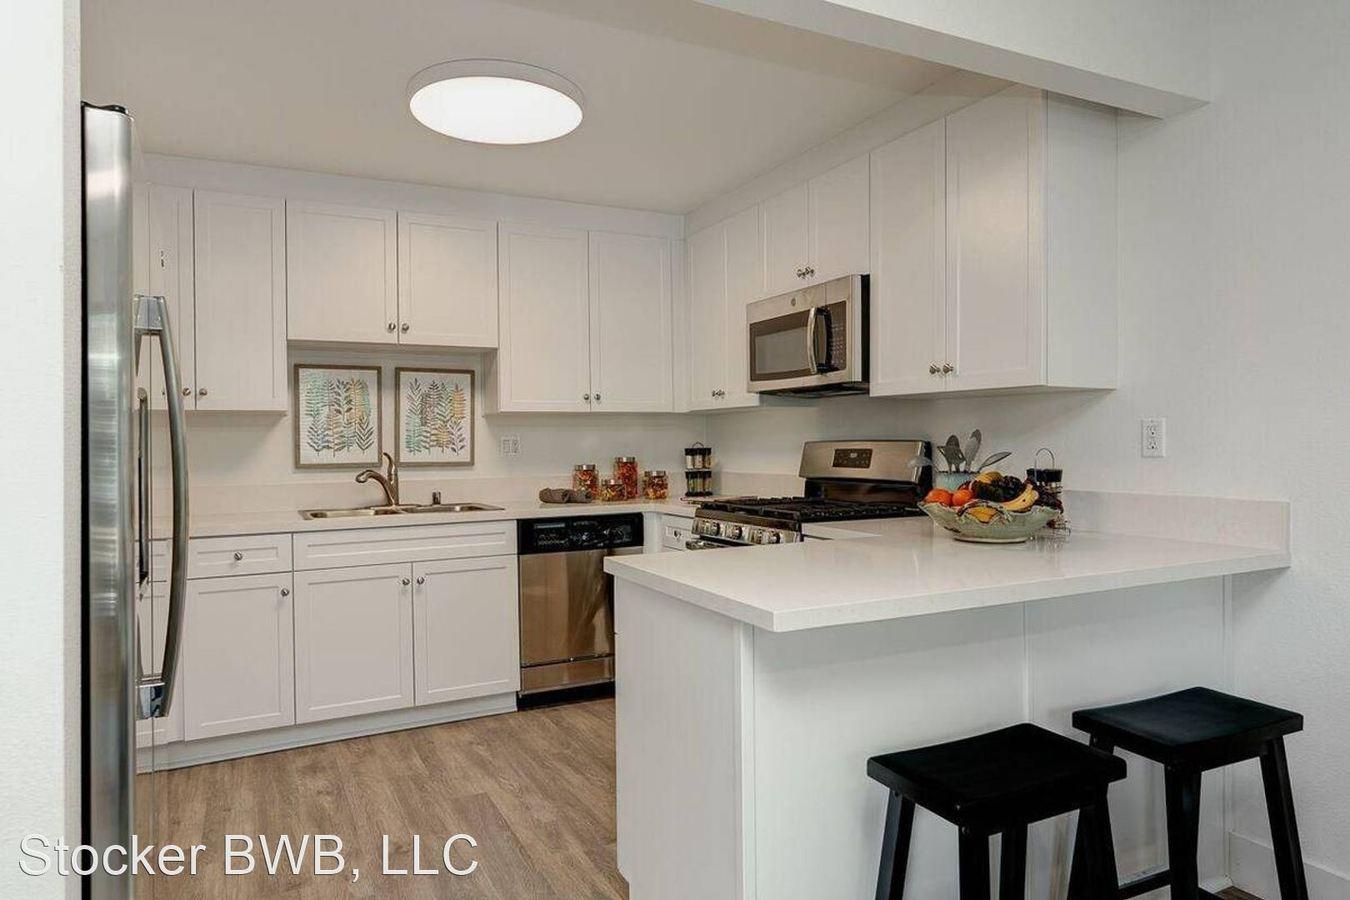 439 W Stocker St Glendale Ca Apartment For Rent